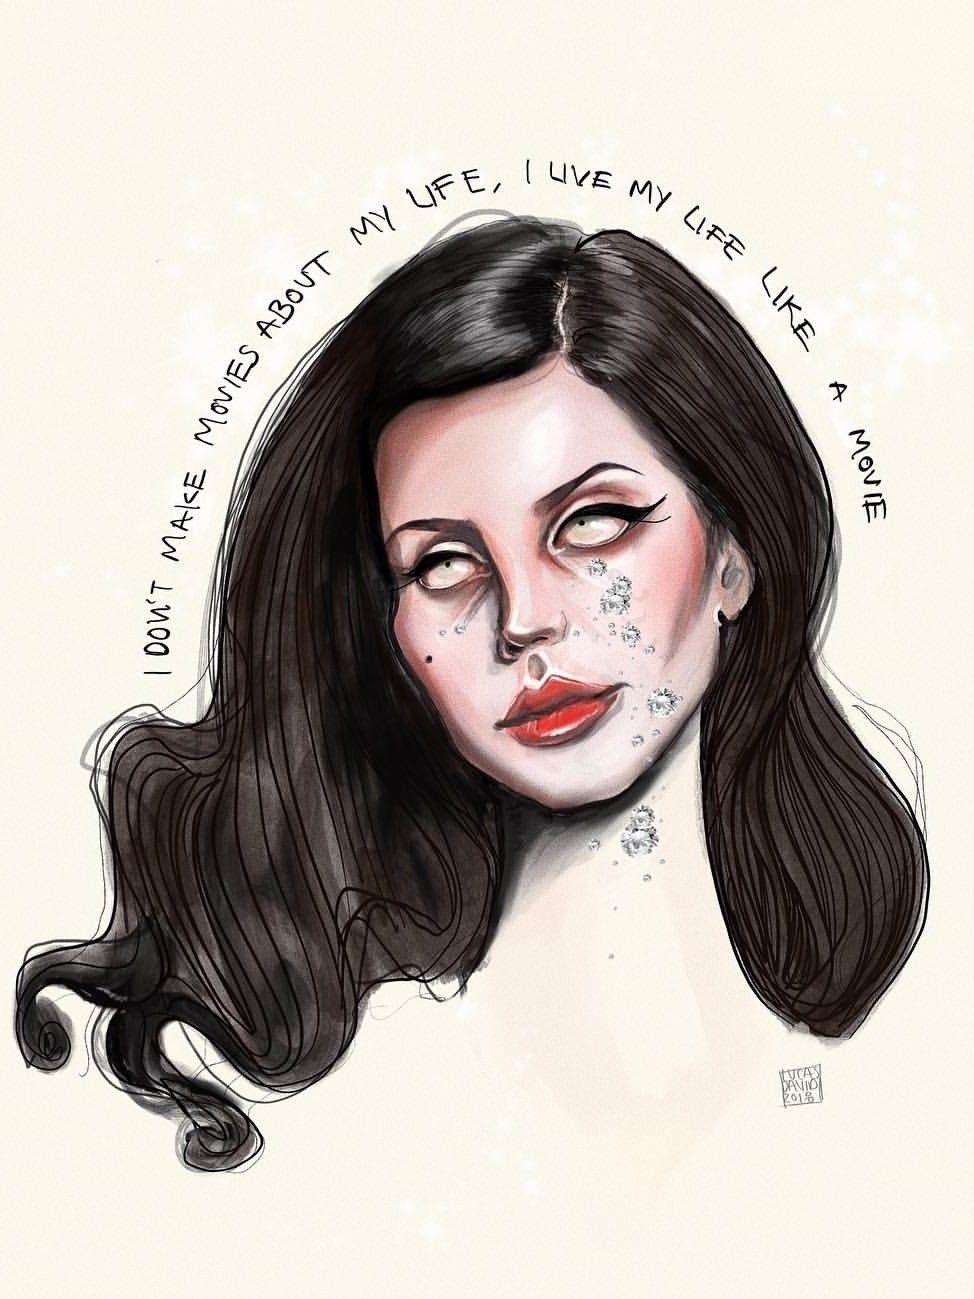 Lana Del Rey Art By Lucas David Lana Del Rey Art Lucas David Lana Del Rey Tattoos